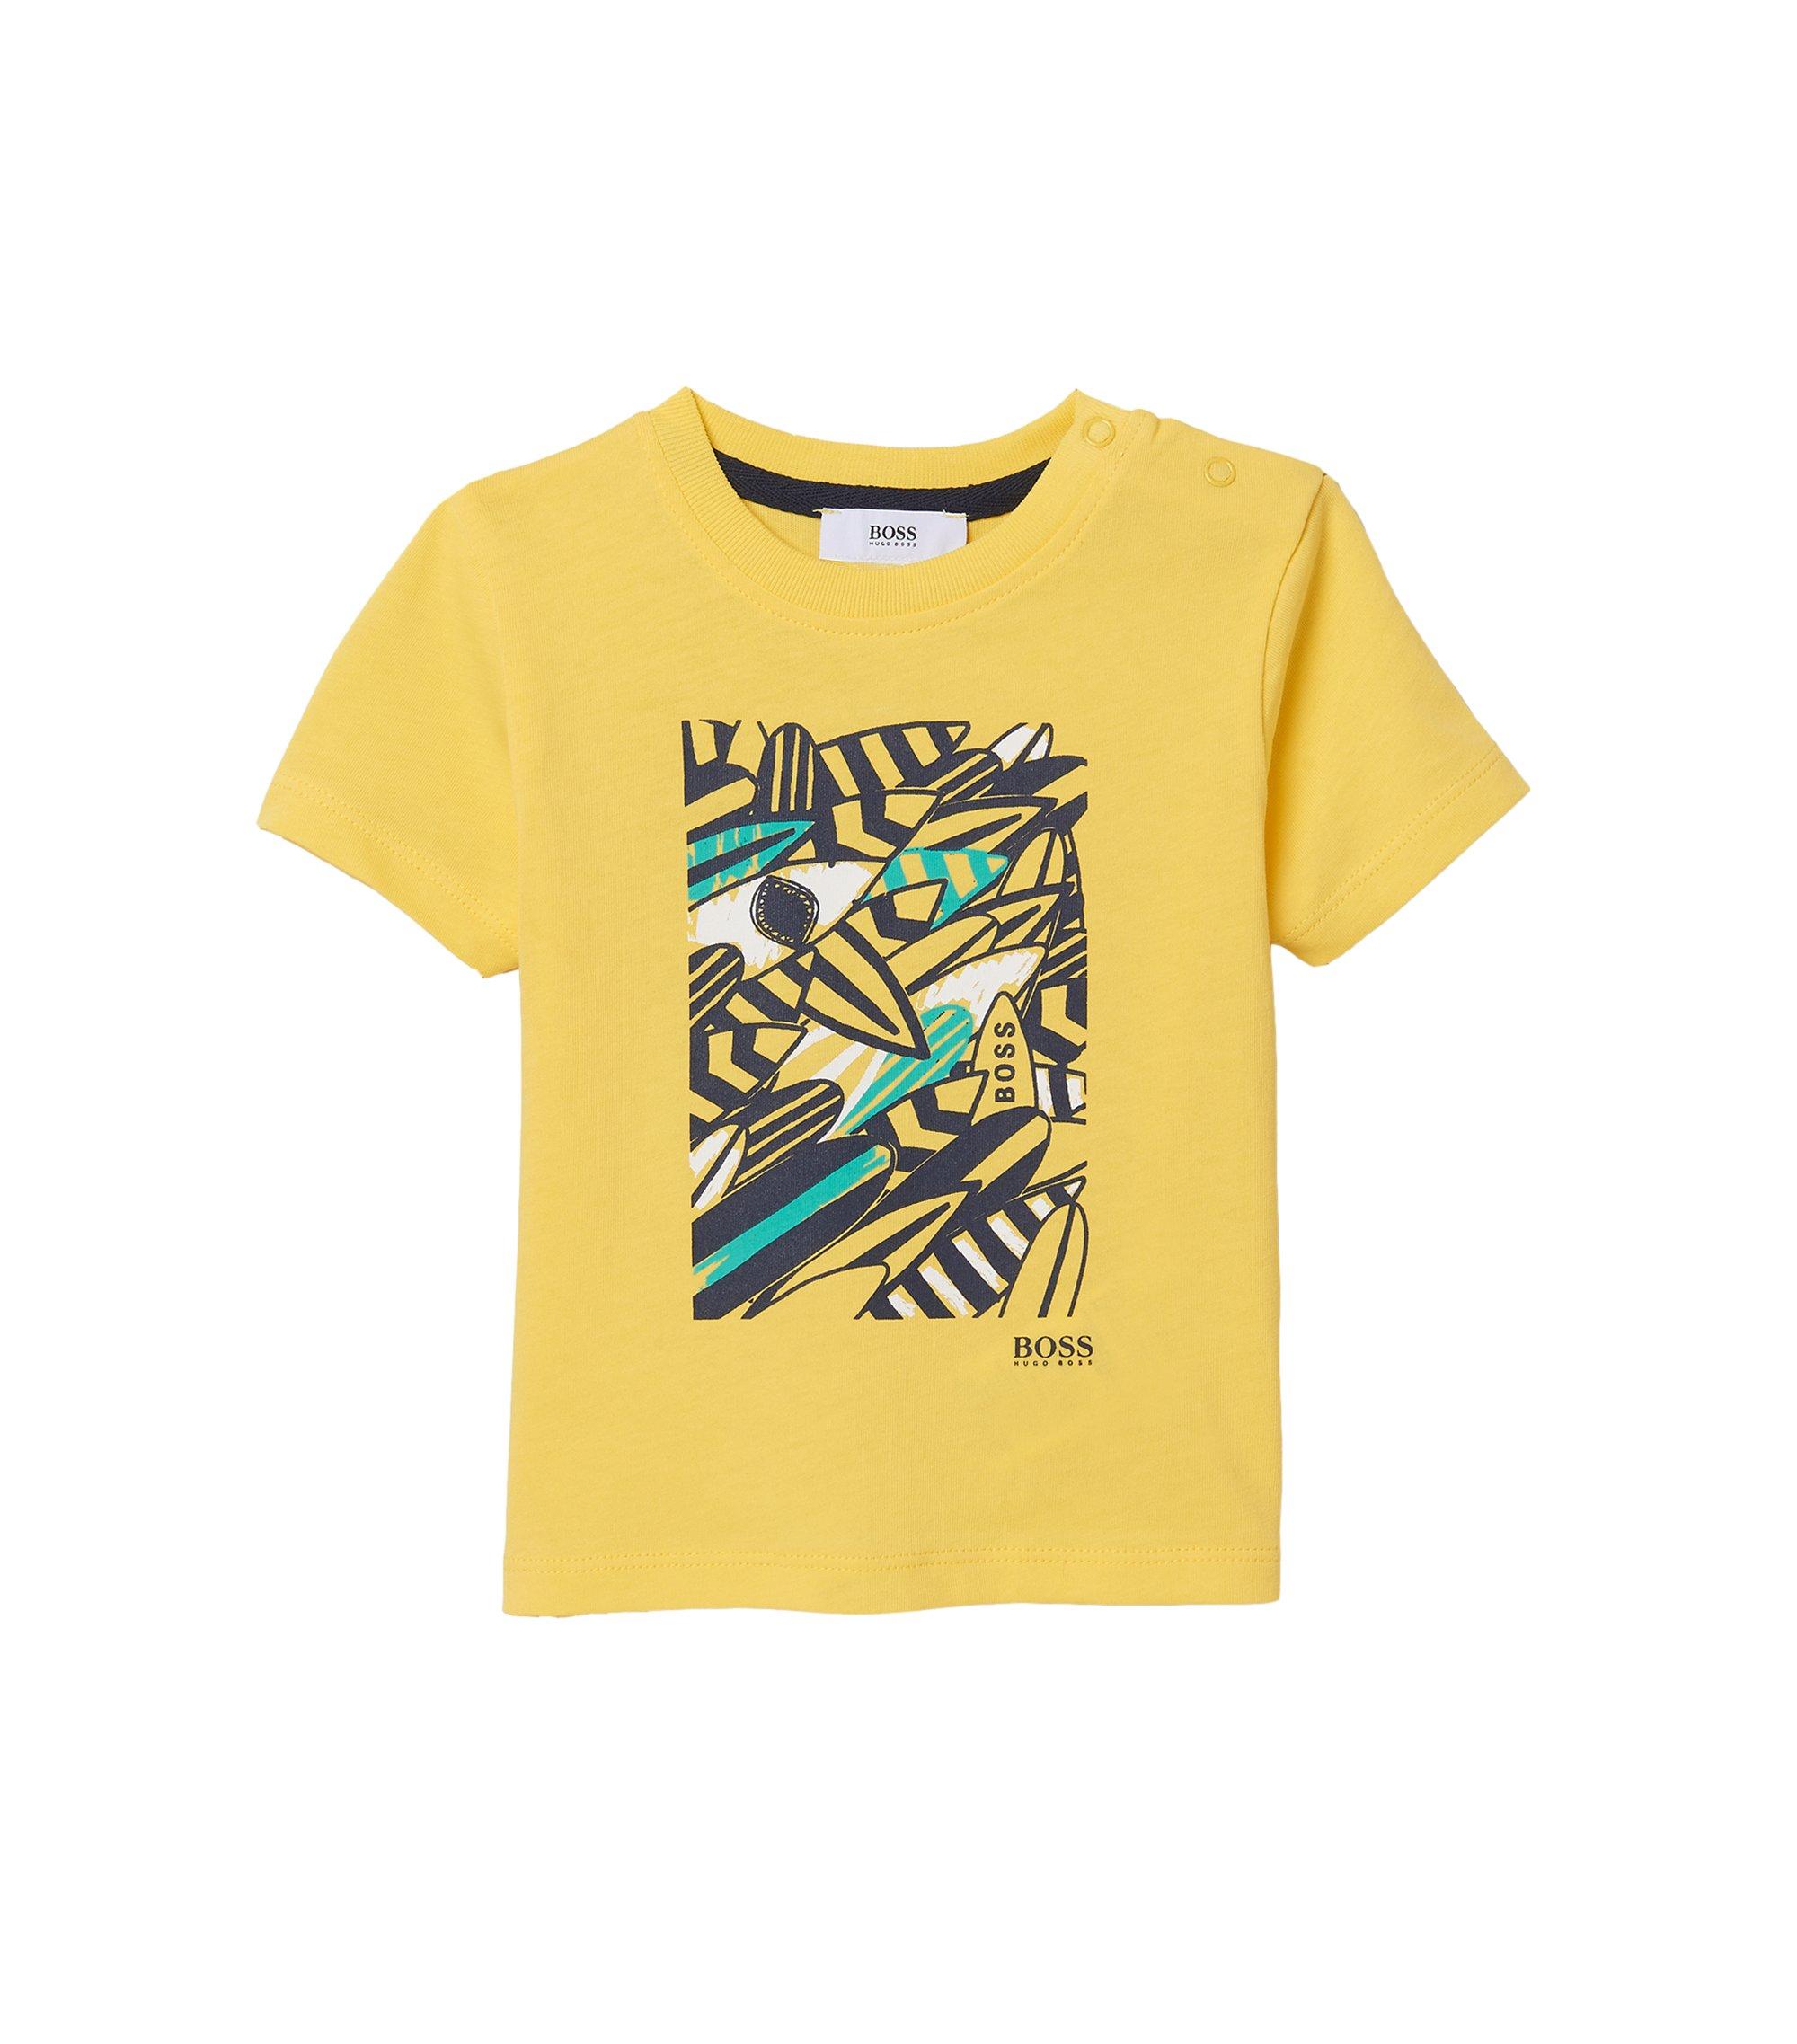 'J05459' | Toddler Cotton Graphic Tee, Yellow